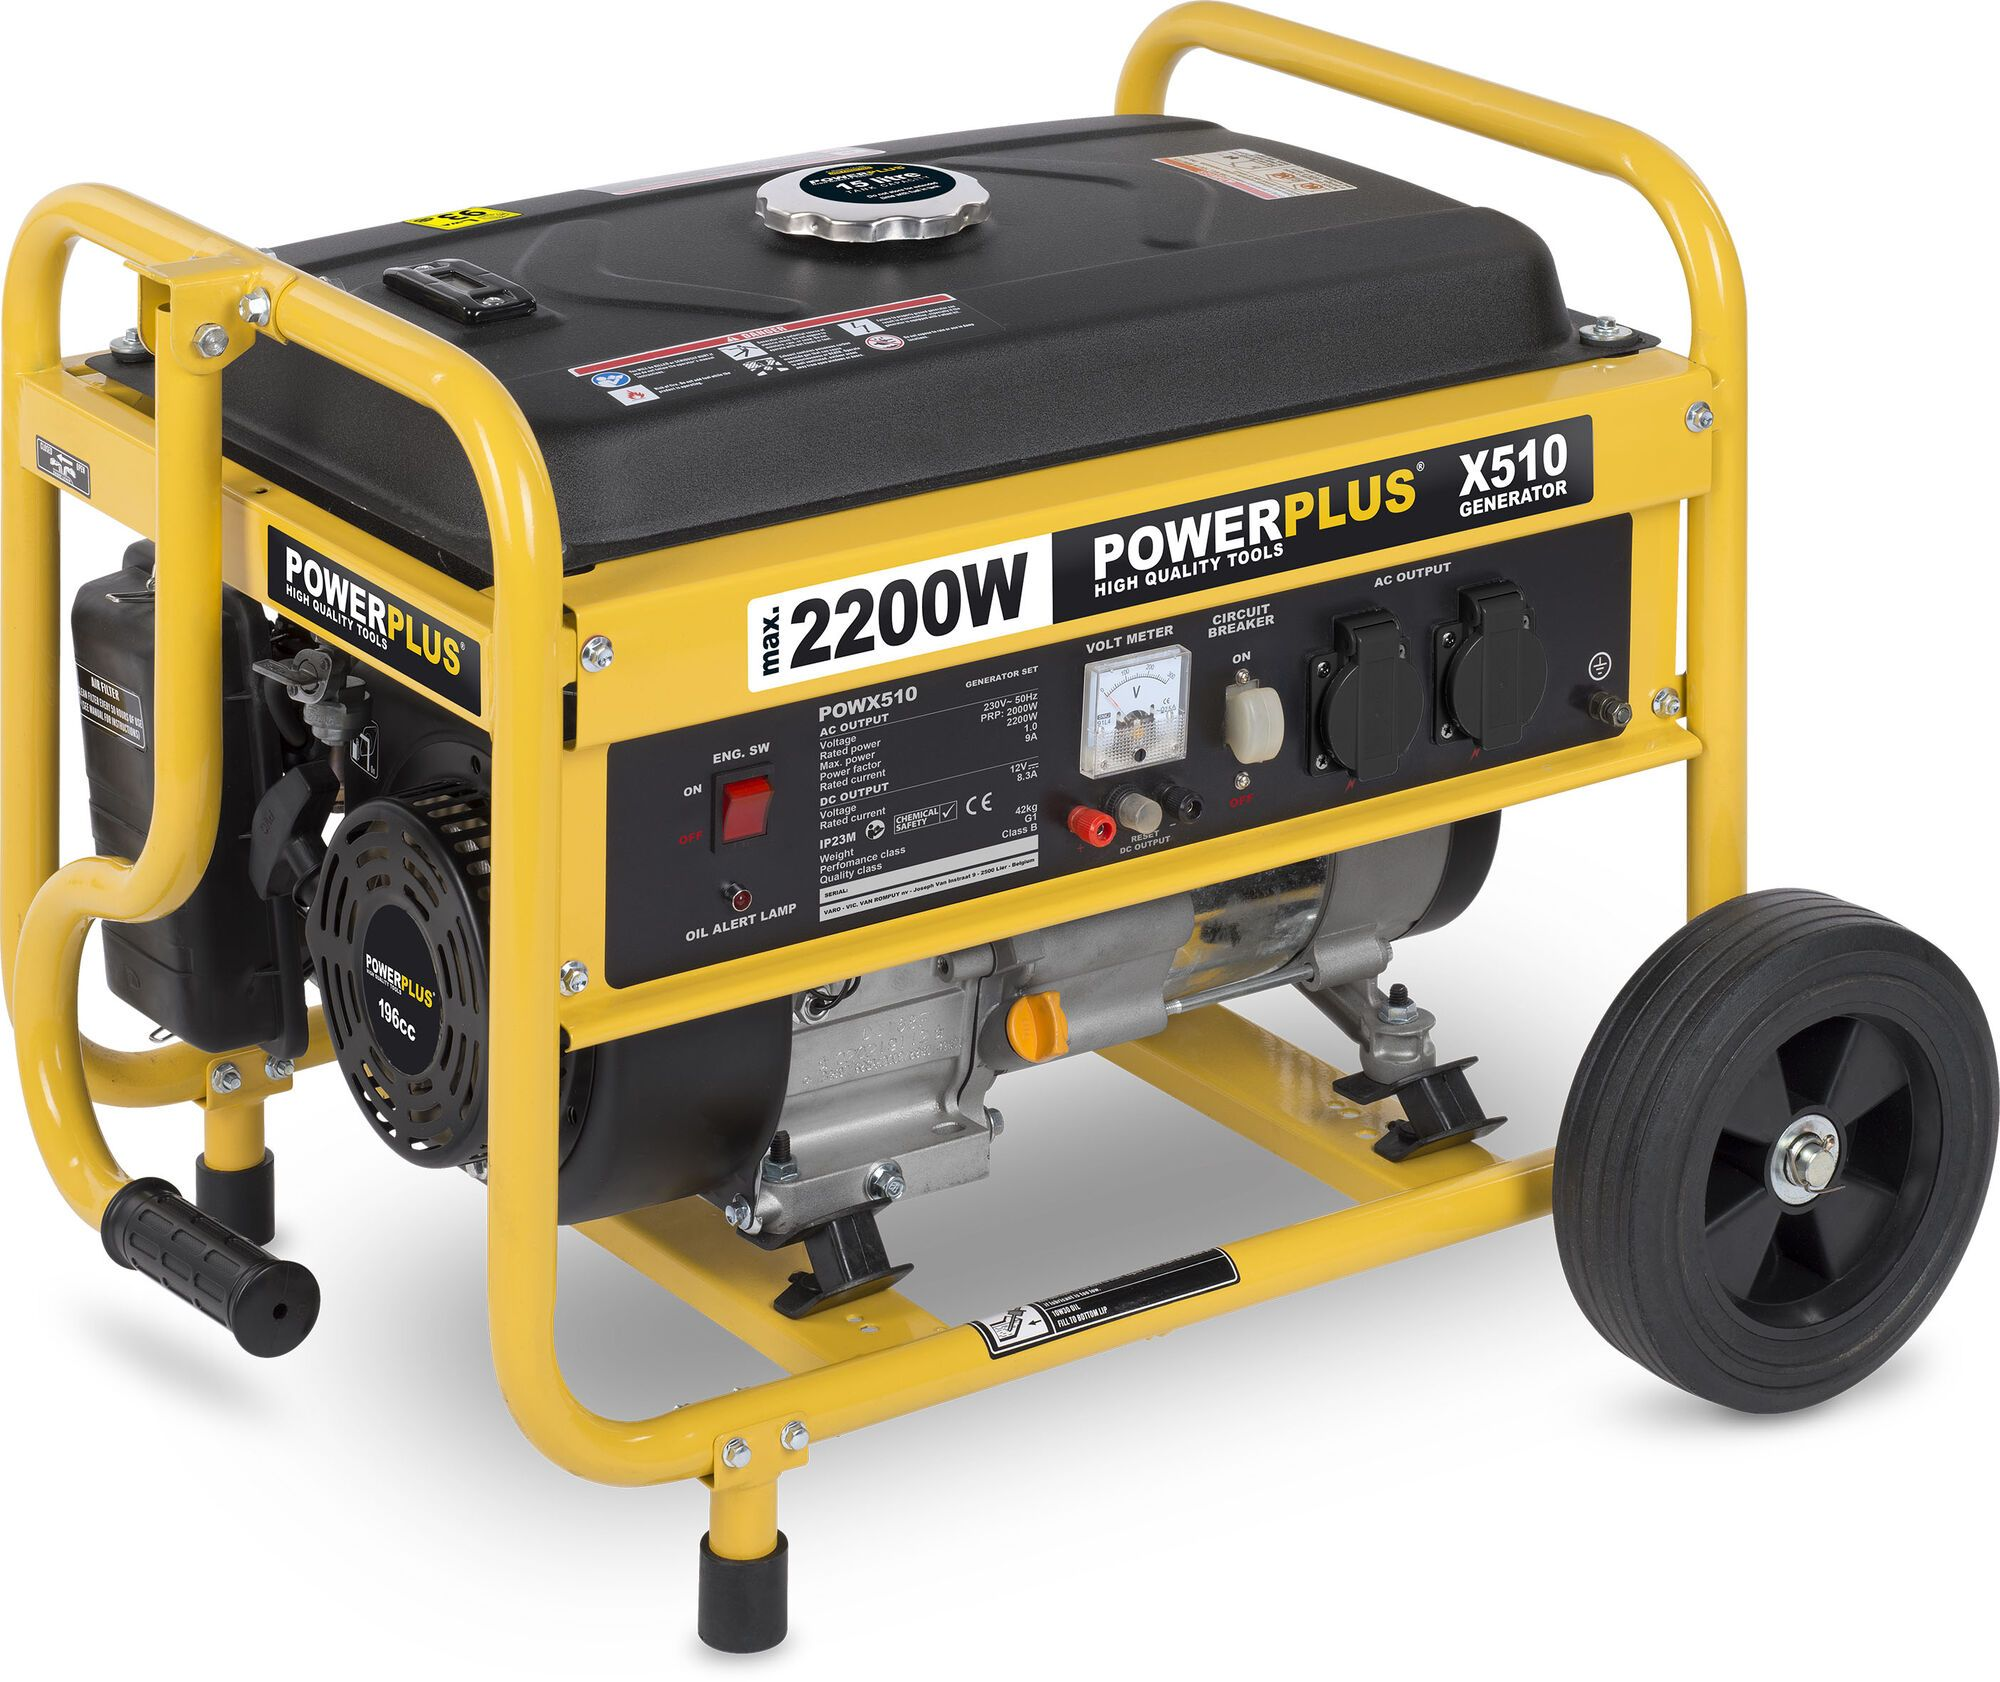 Powerplus POWX510 Benzine generator 196cc | Aggregaat 2000W 230V